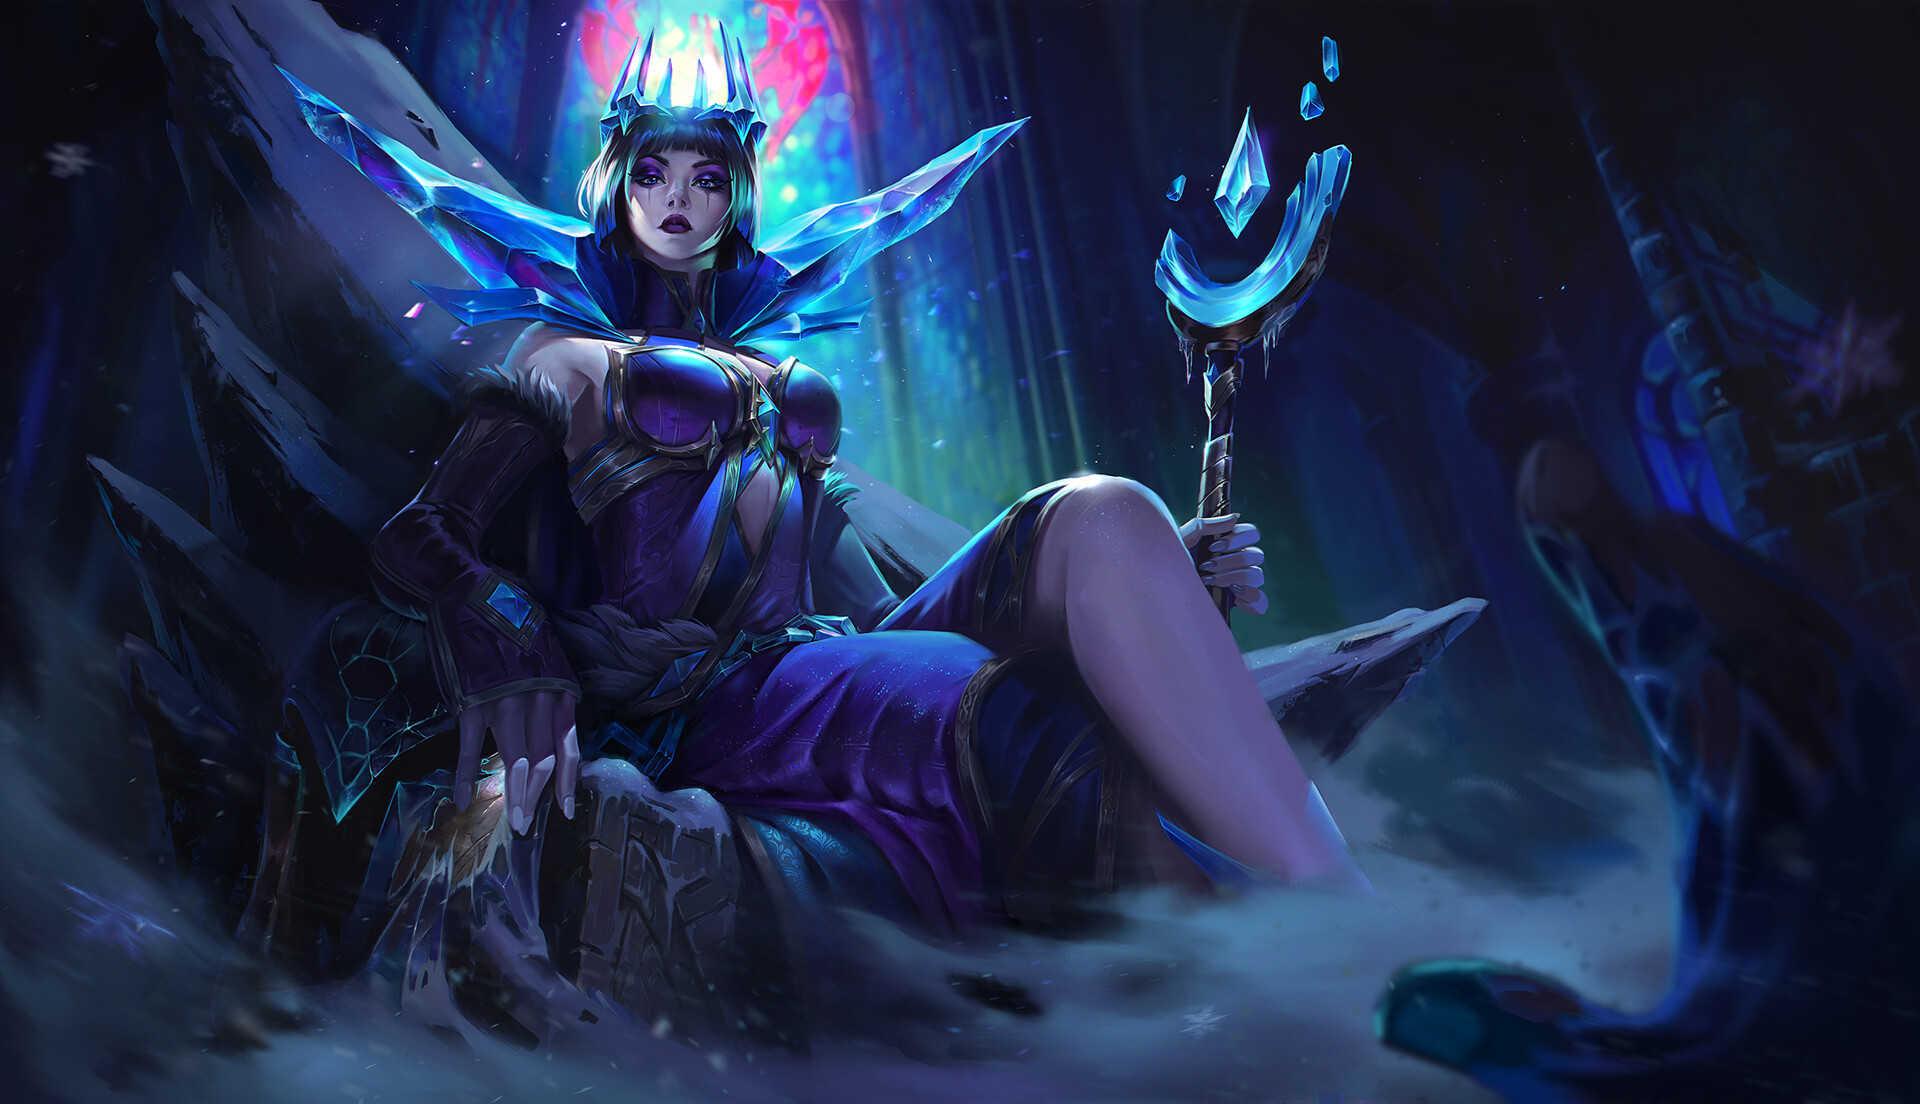 Dark League Of Legends Hd Image Leblanc